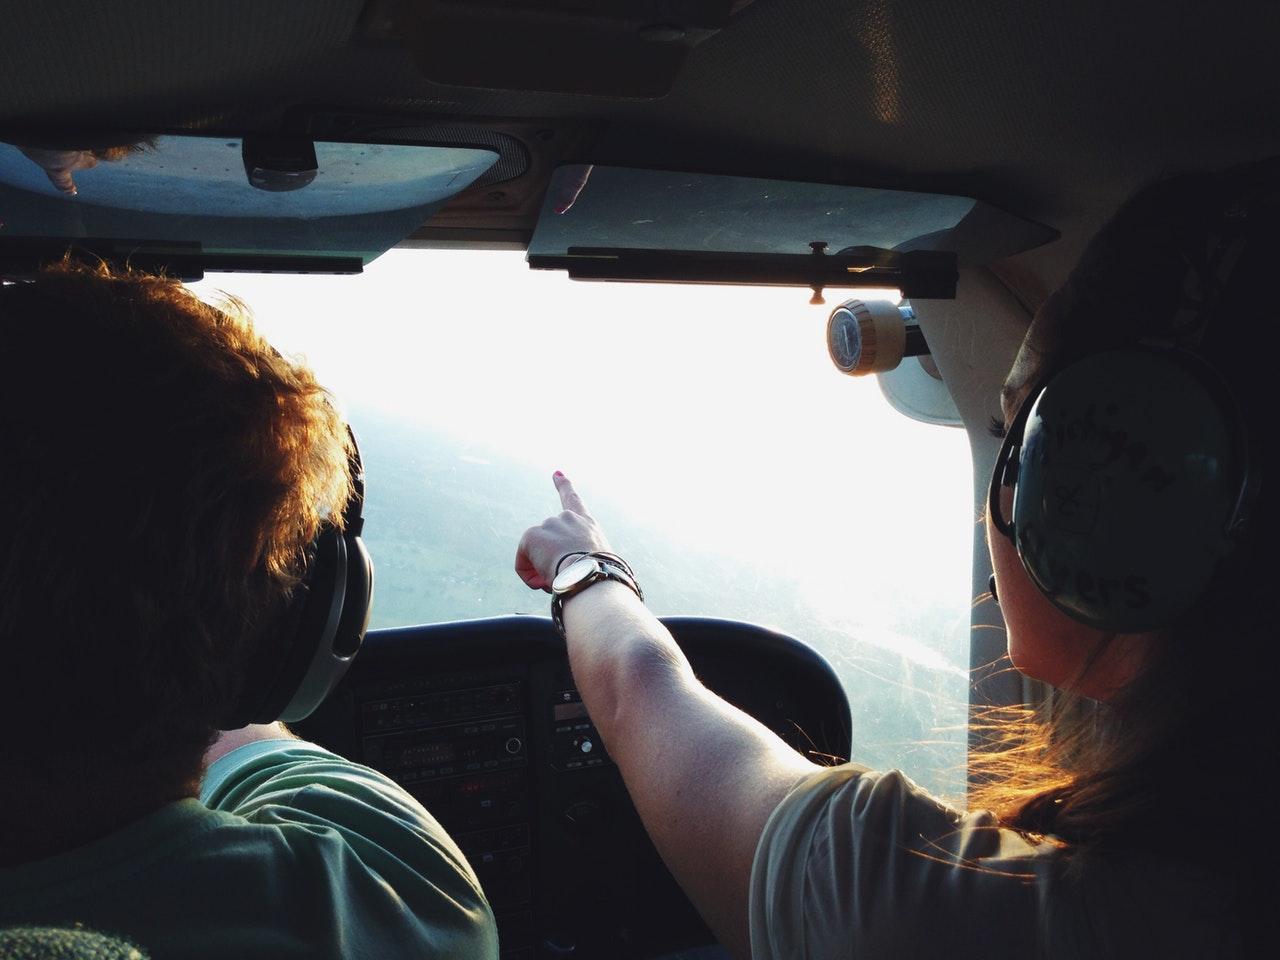 Pilots talking